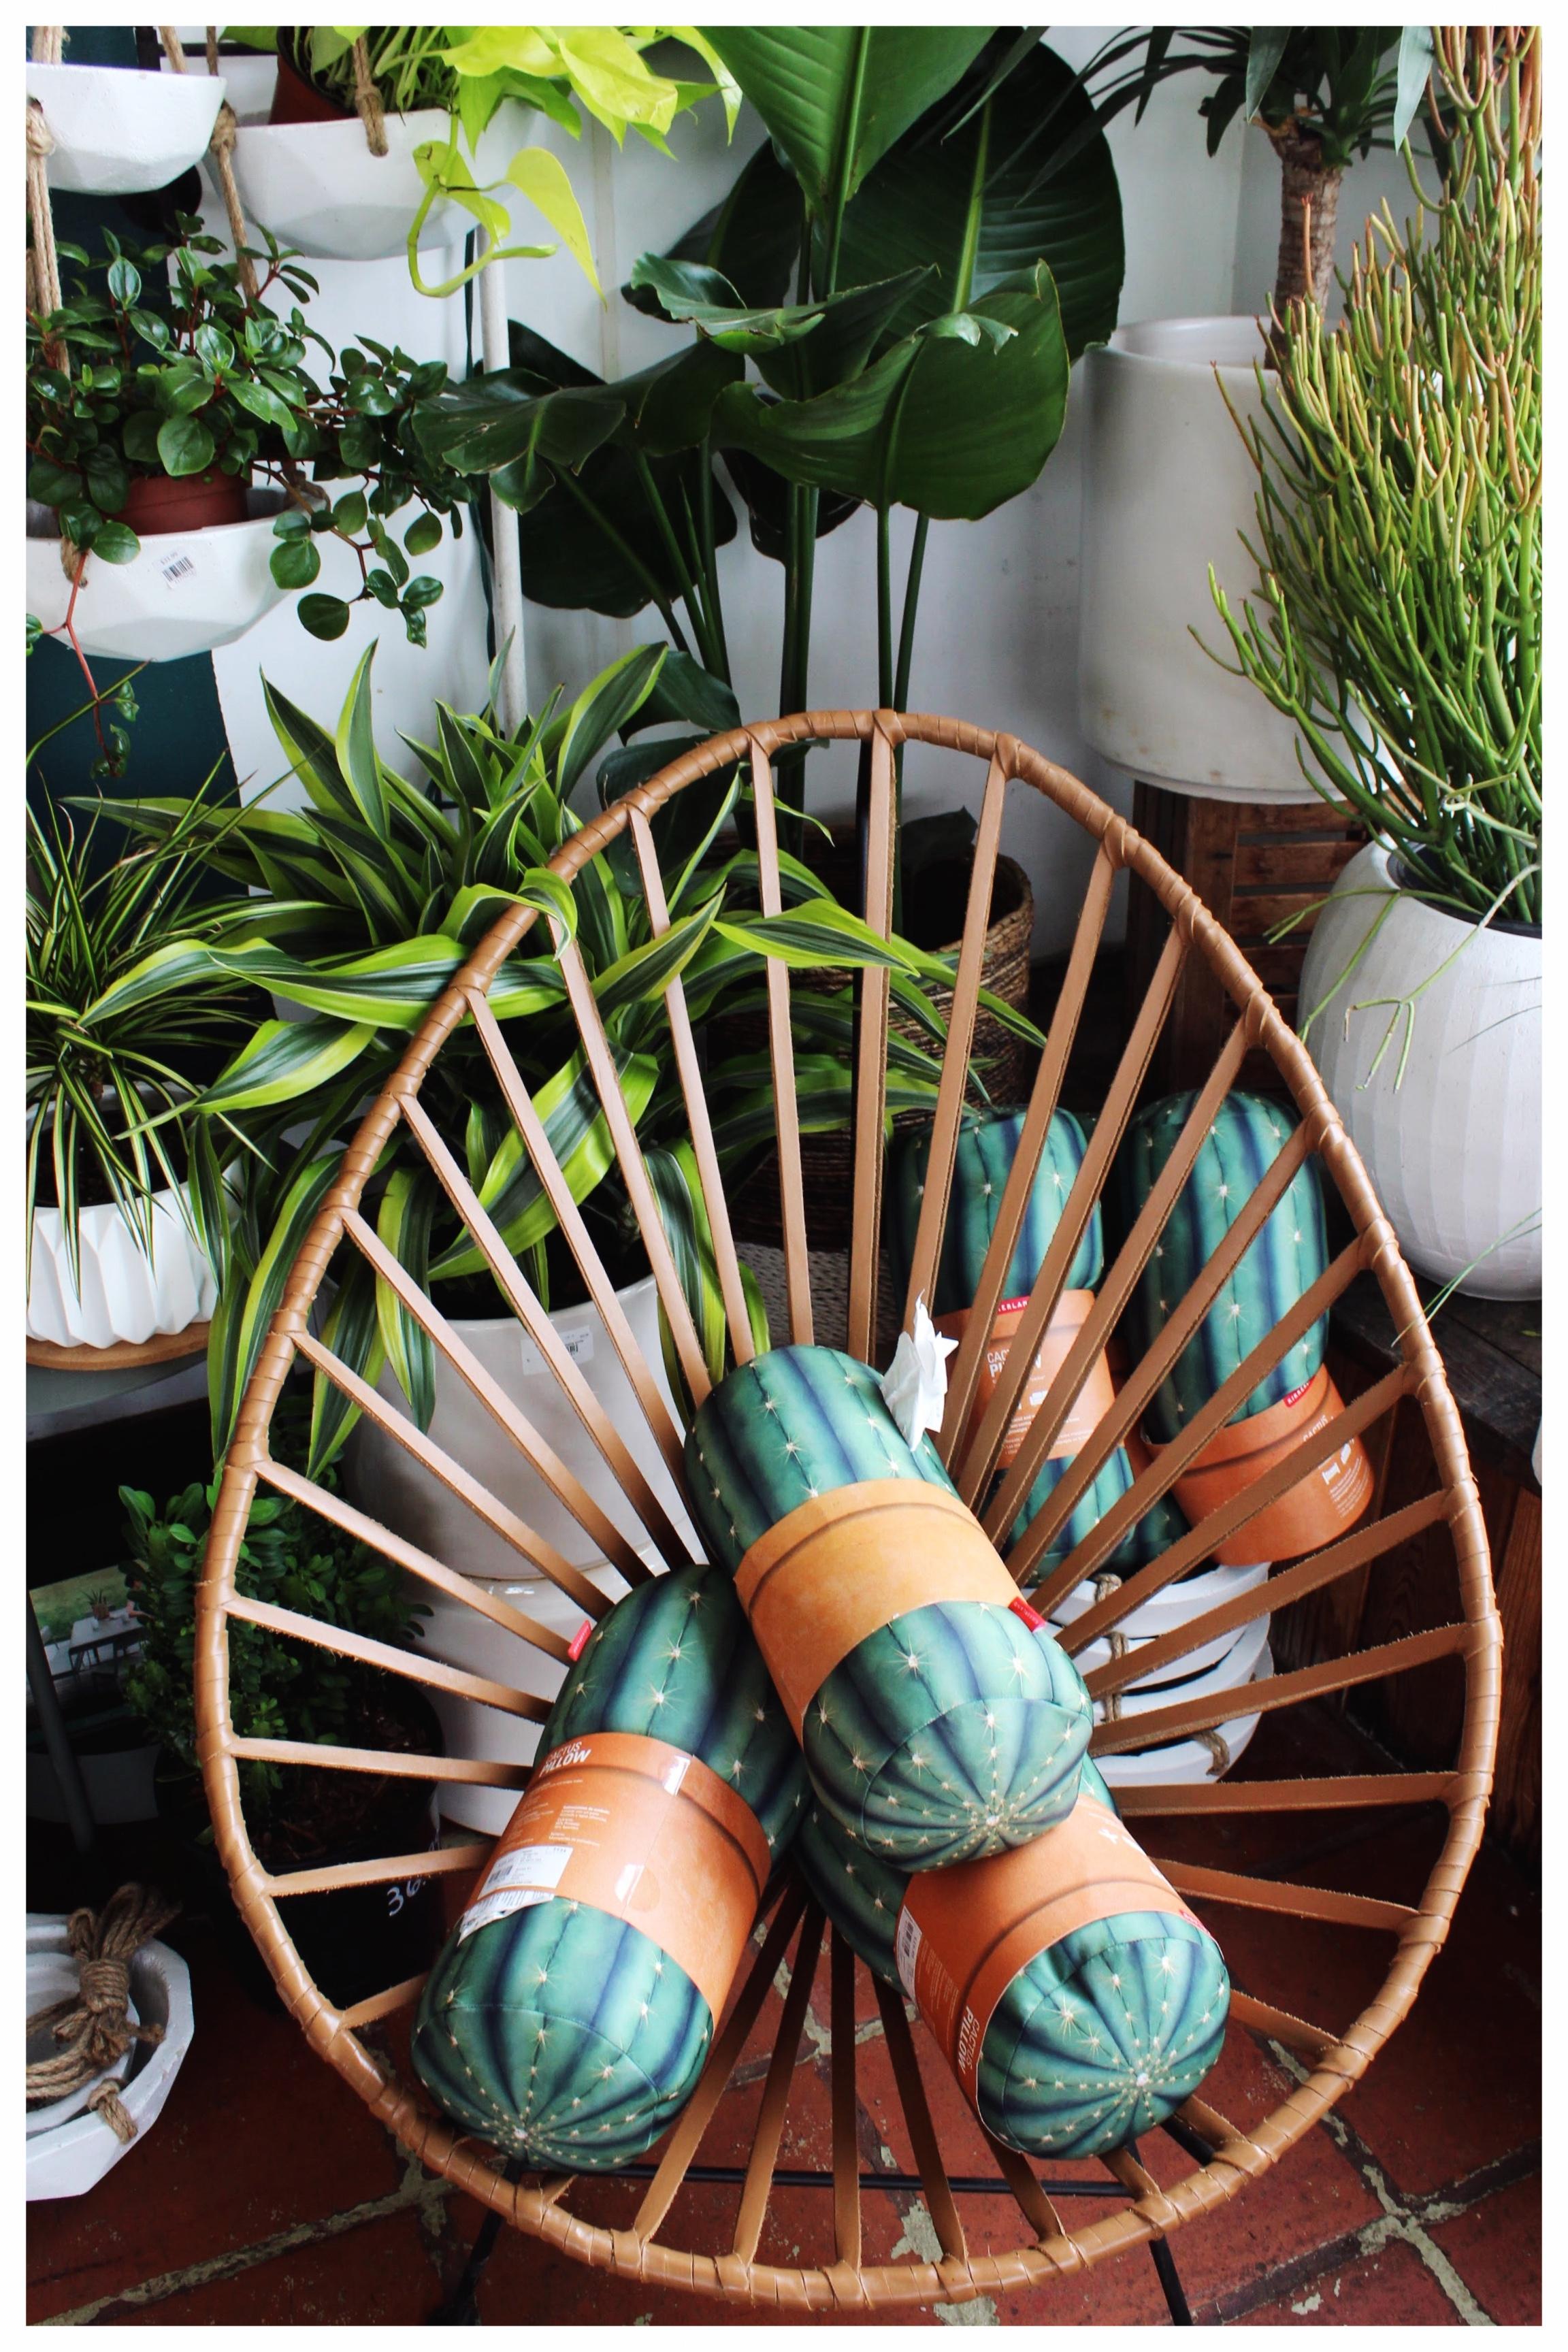 Woven Chair and Plush Pillow Display at Dig Gardens in Santa Cruz